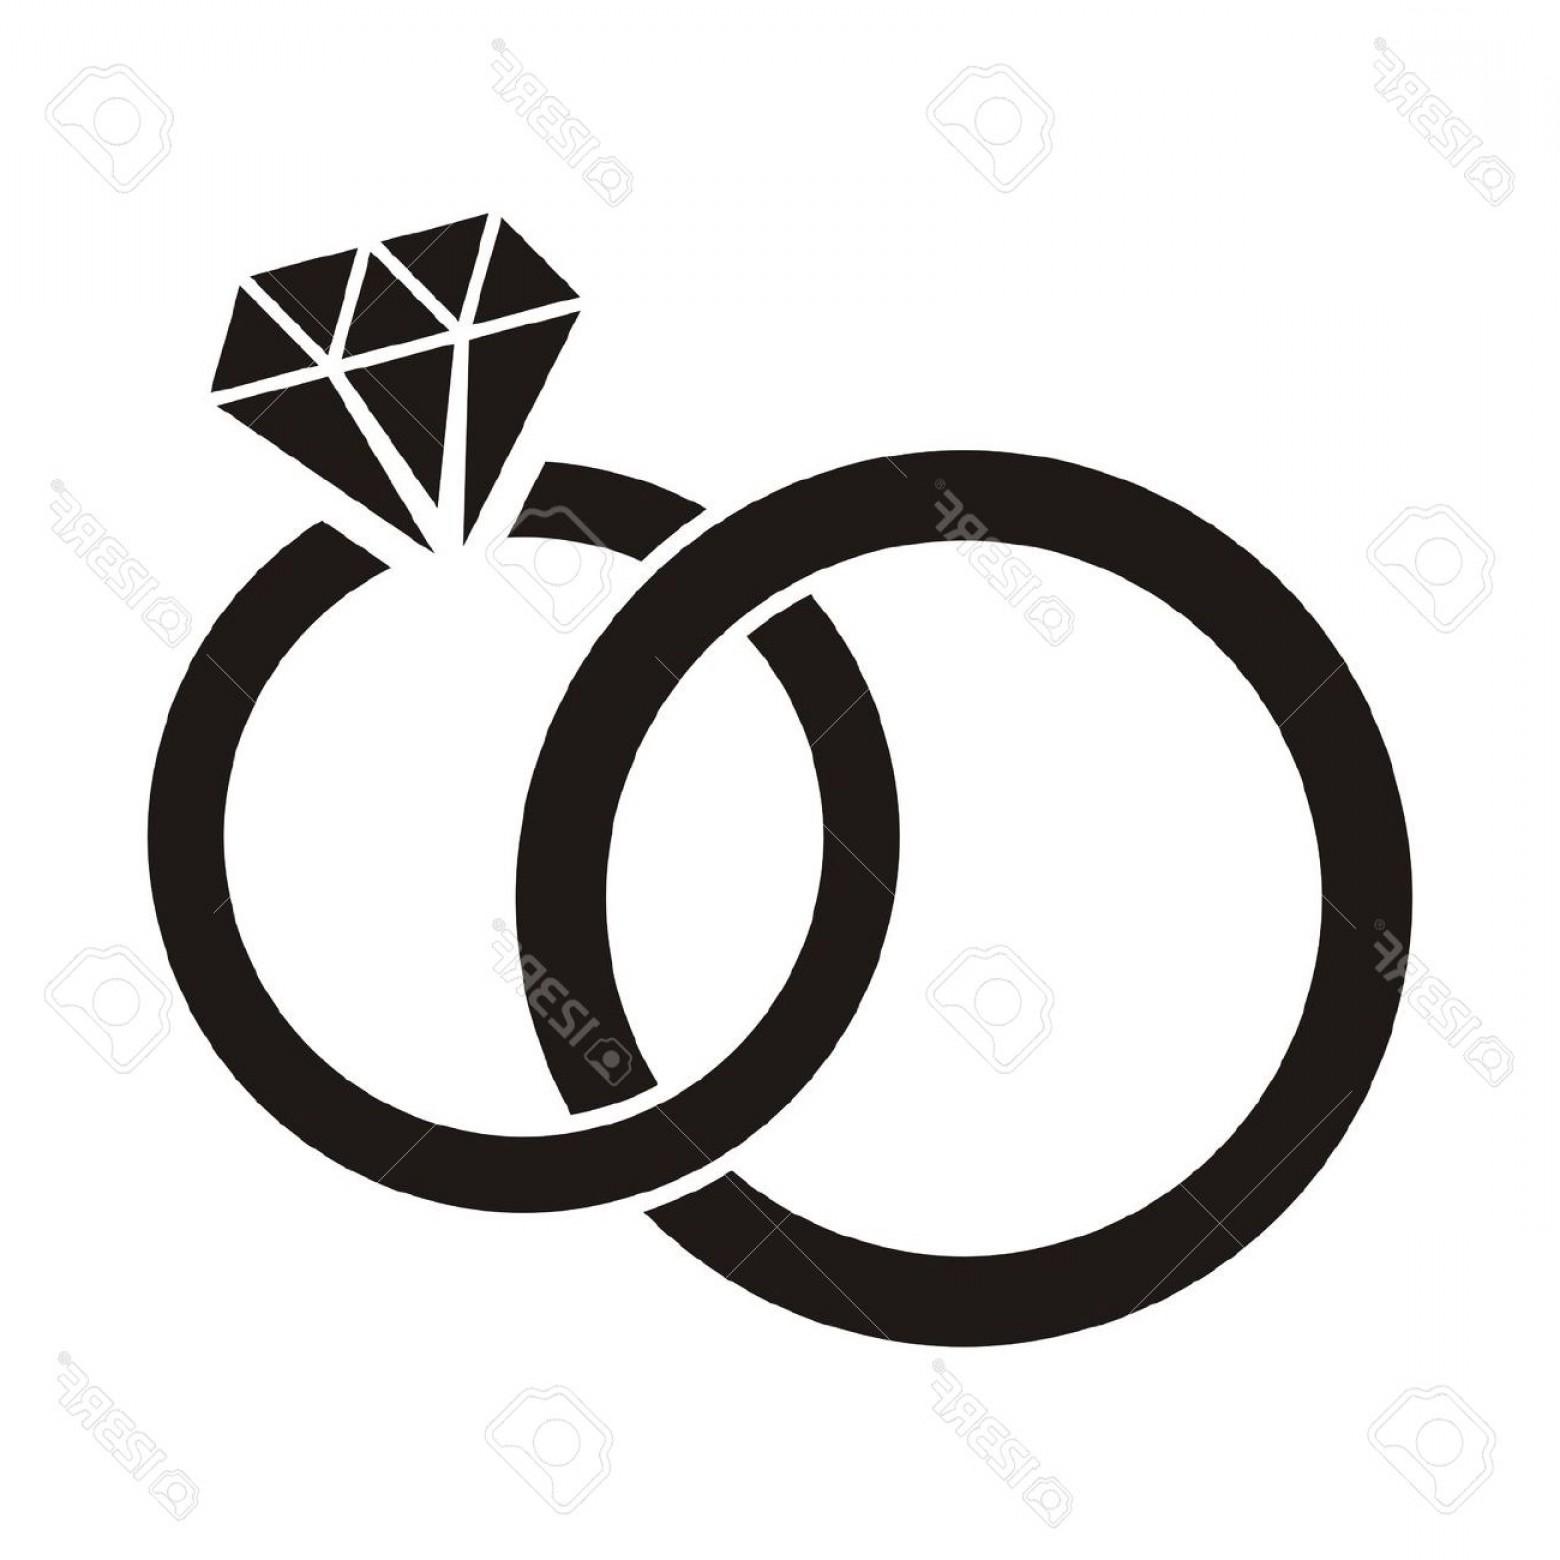 1560x1560 Clipart Wedding Rings Intertwined Wedding Ideas